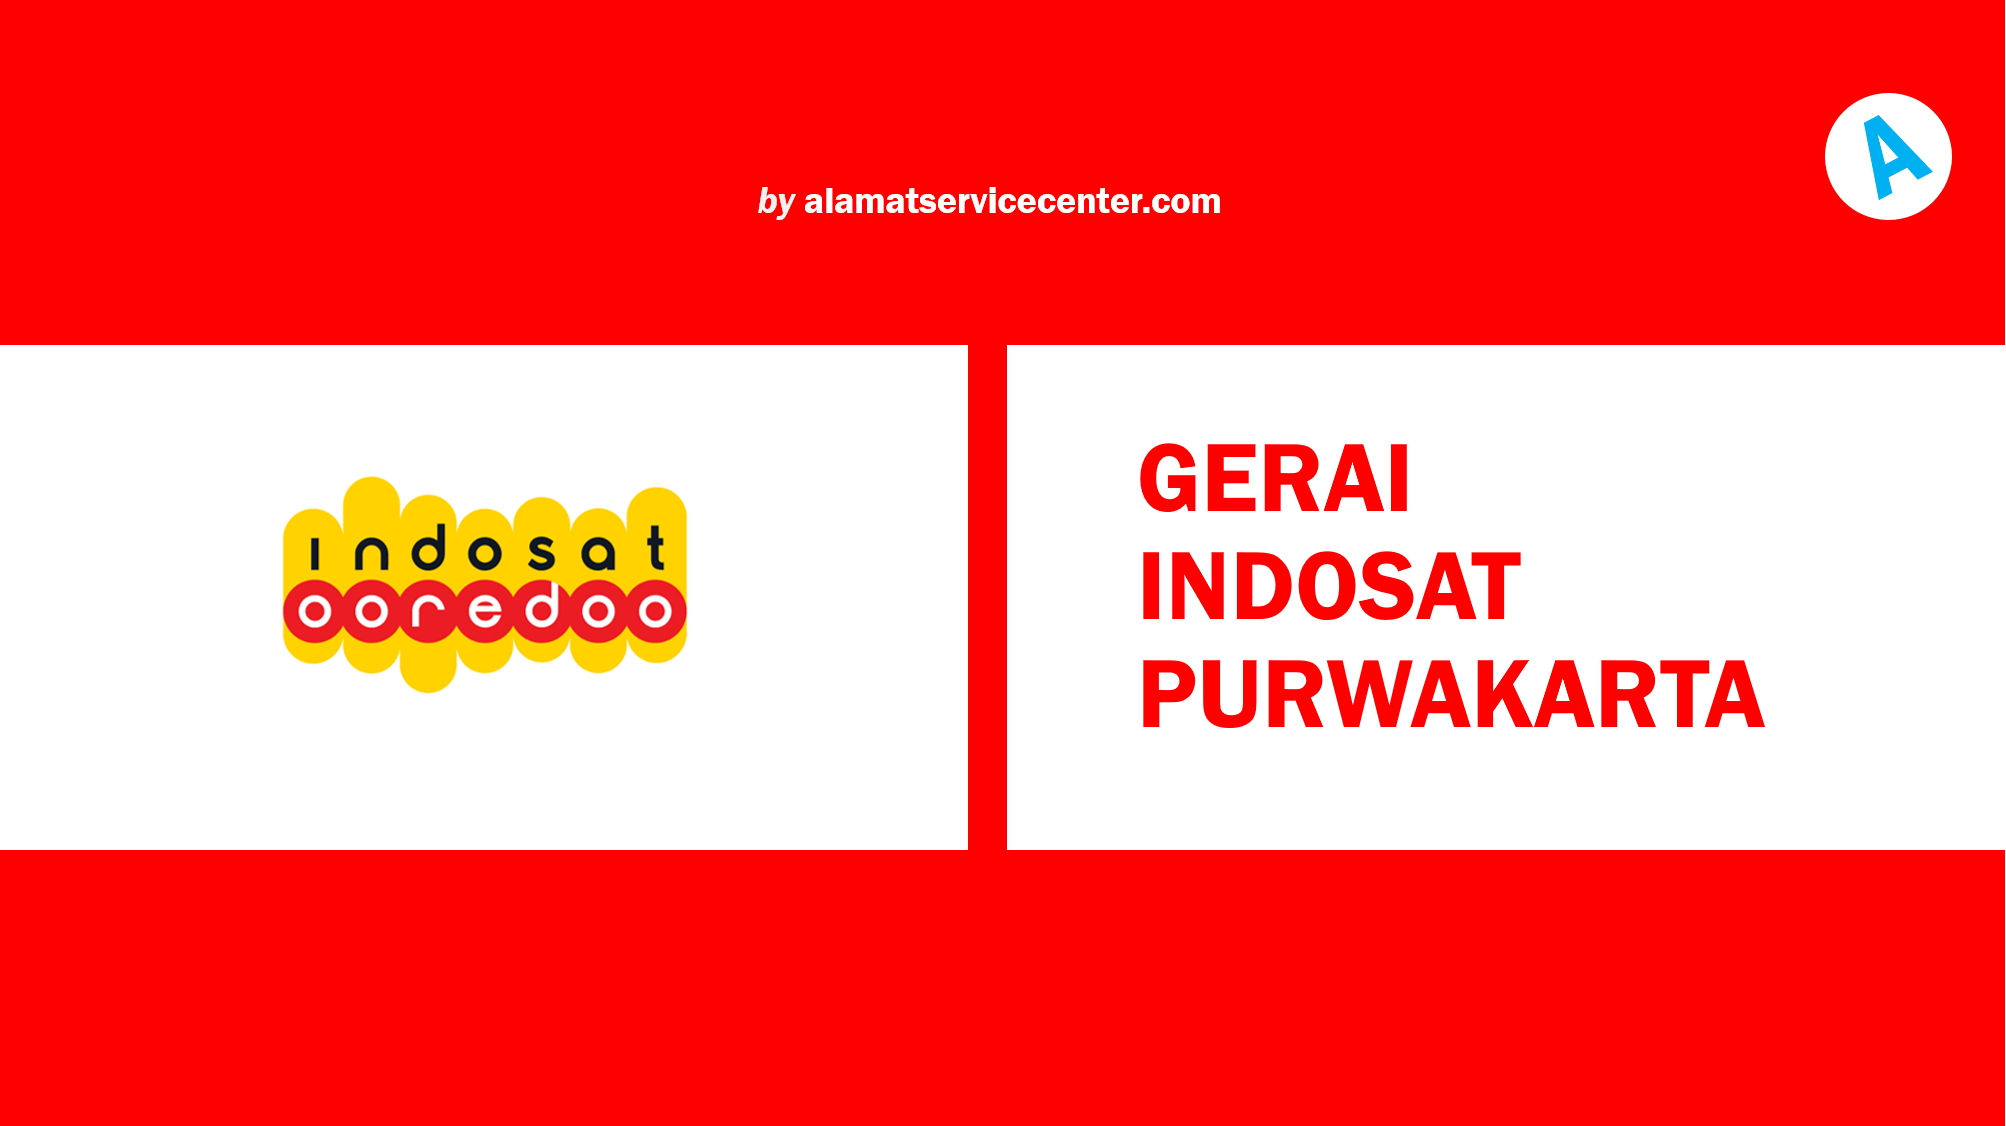 Gerai Indosat Purwakarta